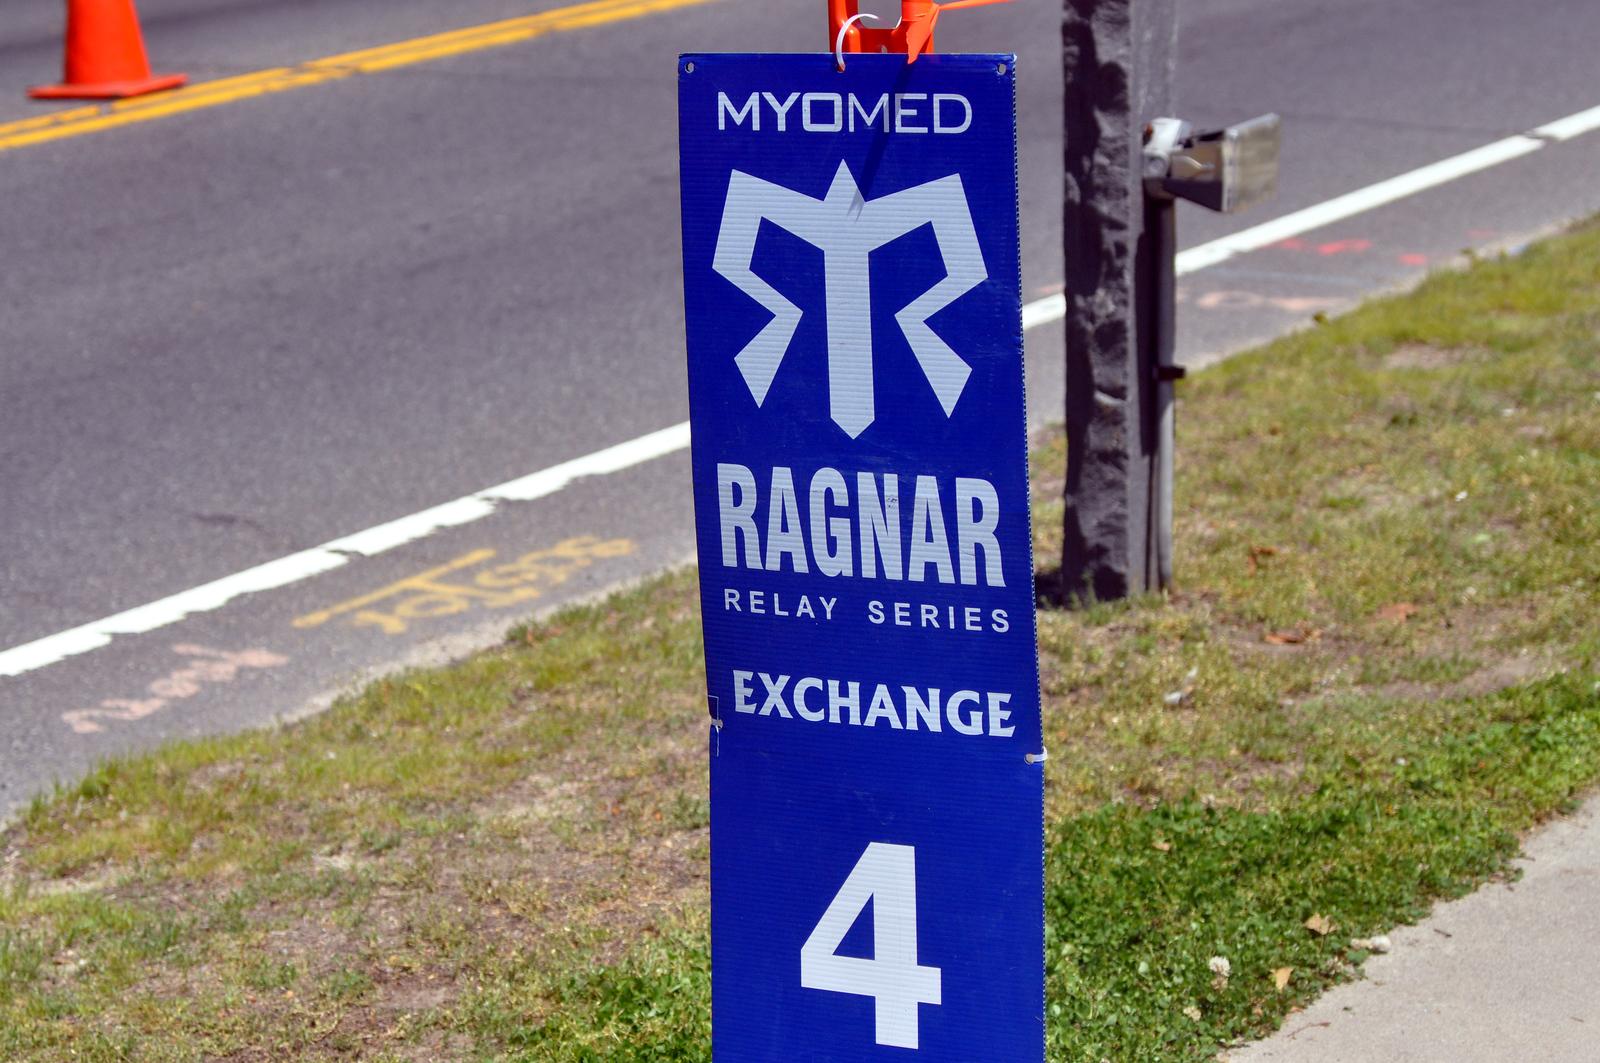 exchange 4